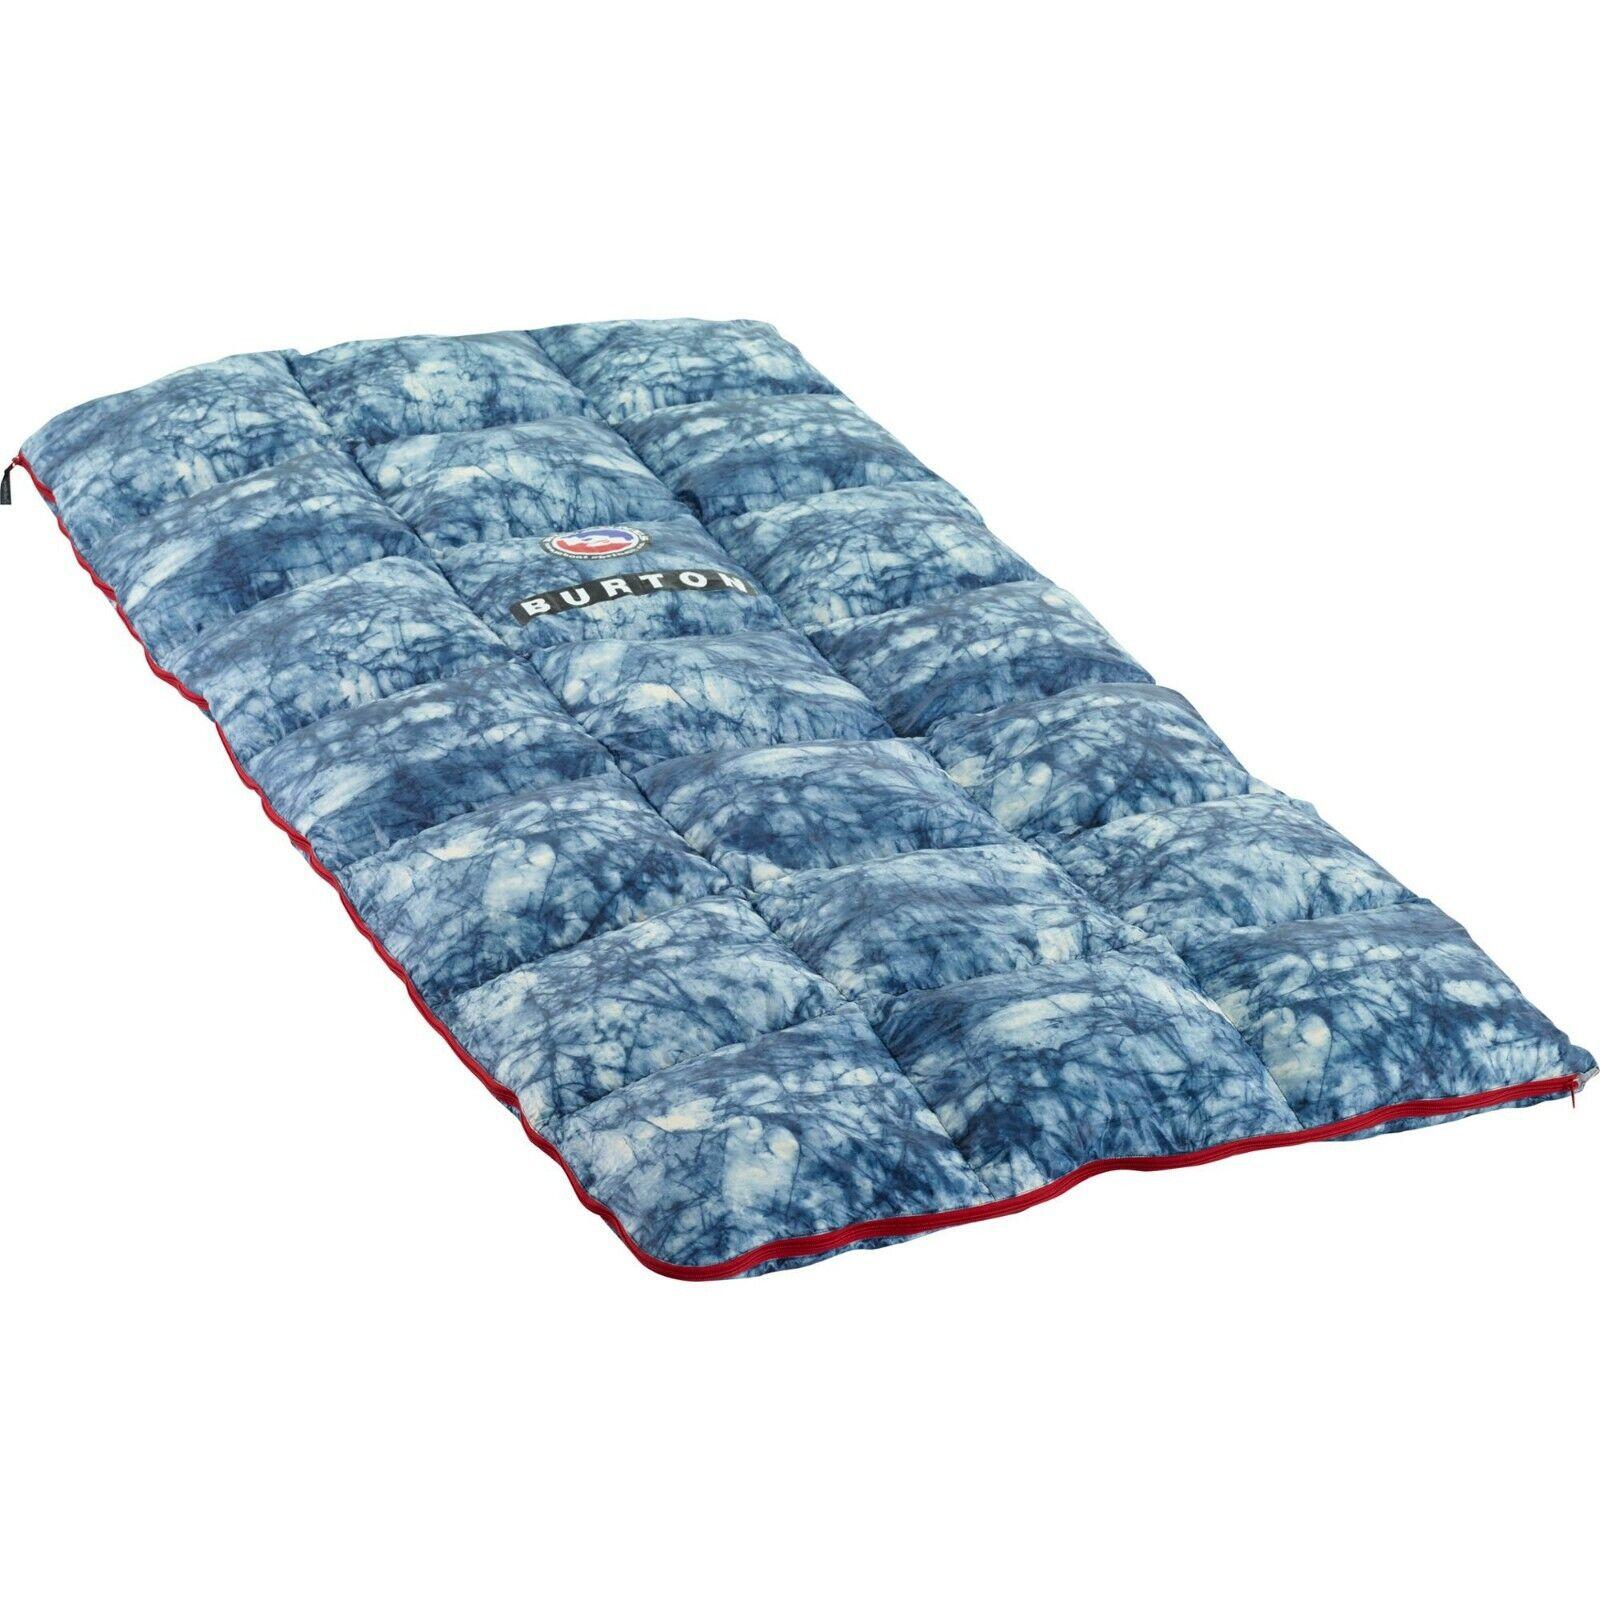 Burton gree Agnes x the Dirt borsa Sleeping borsa 39.2°F Rectangular campeggio all'aperto